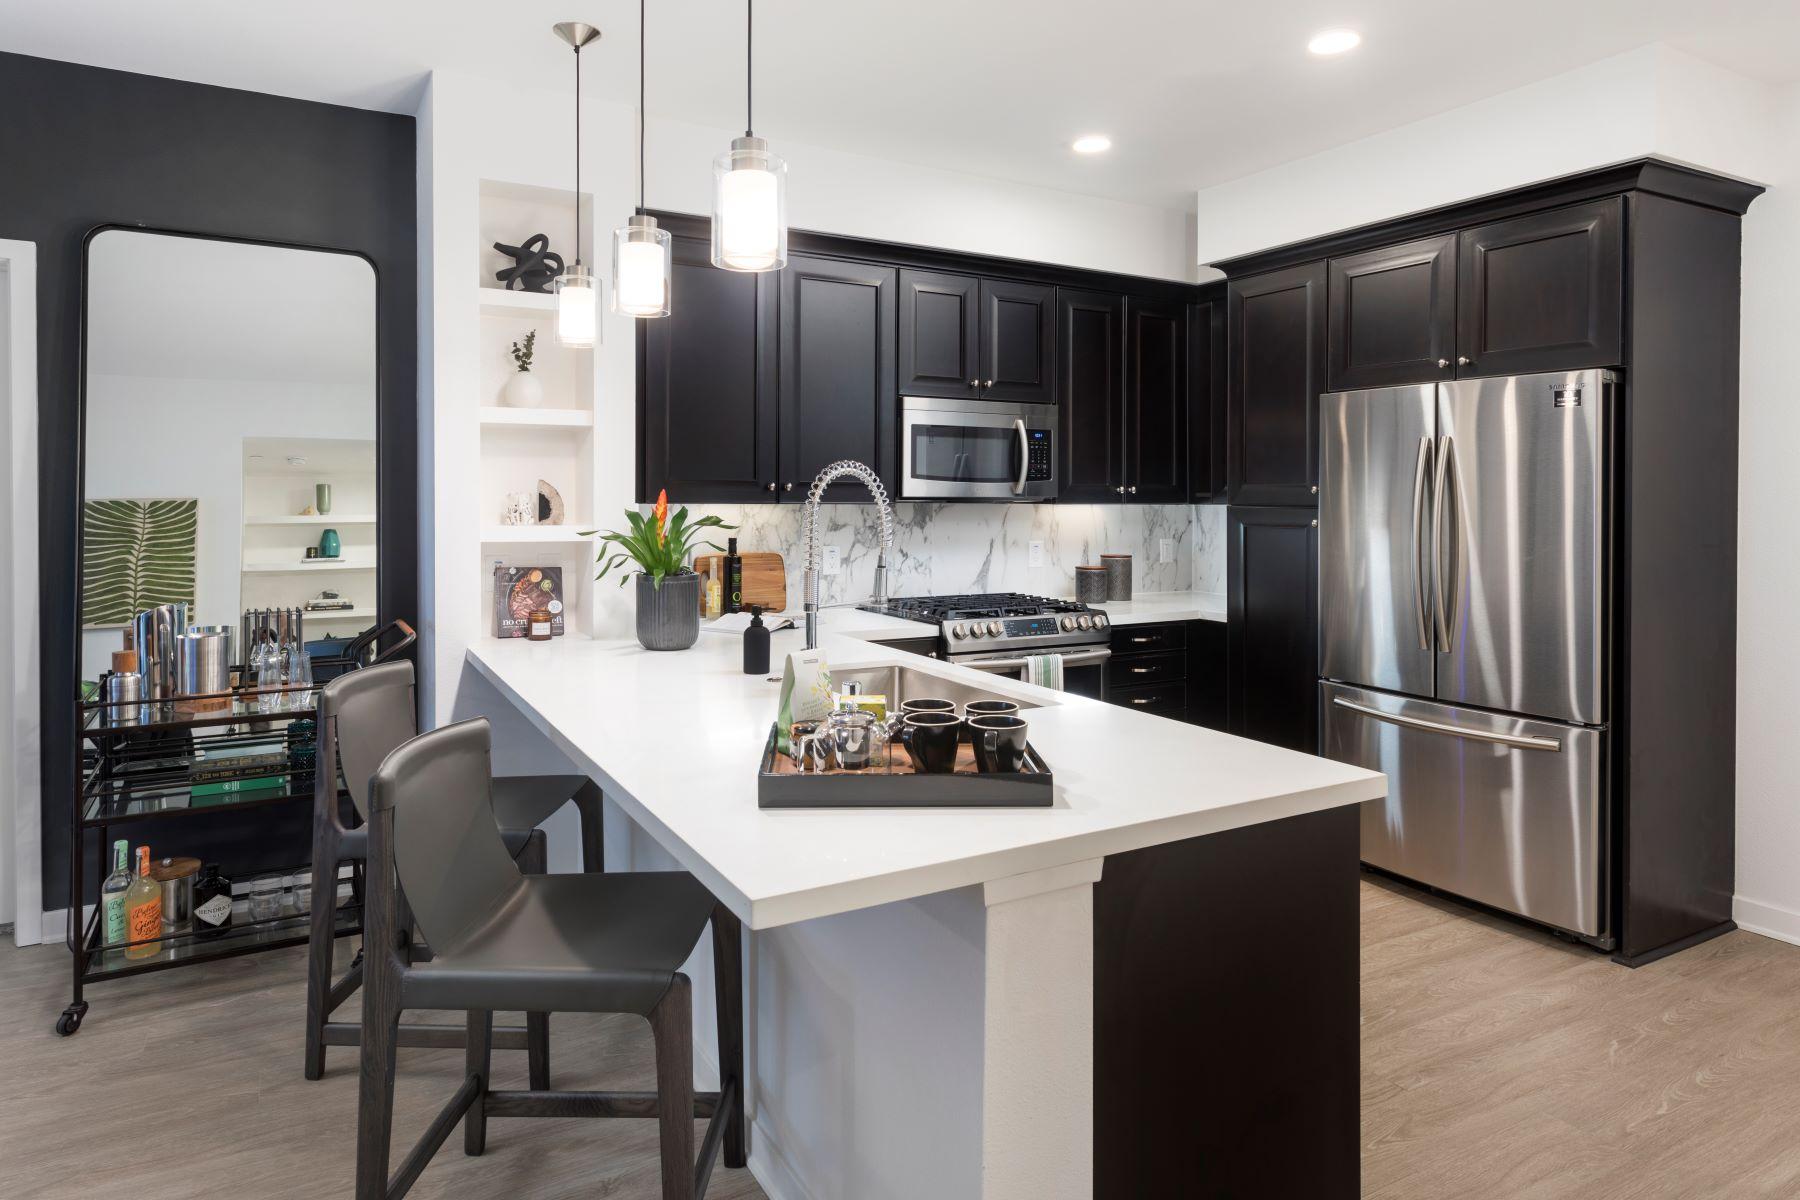 designer kitchen with stainless steel appliances at broadstone arden